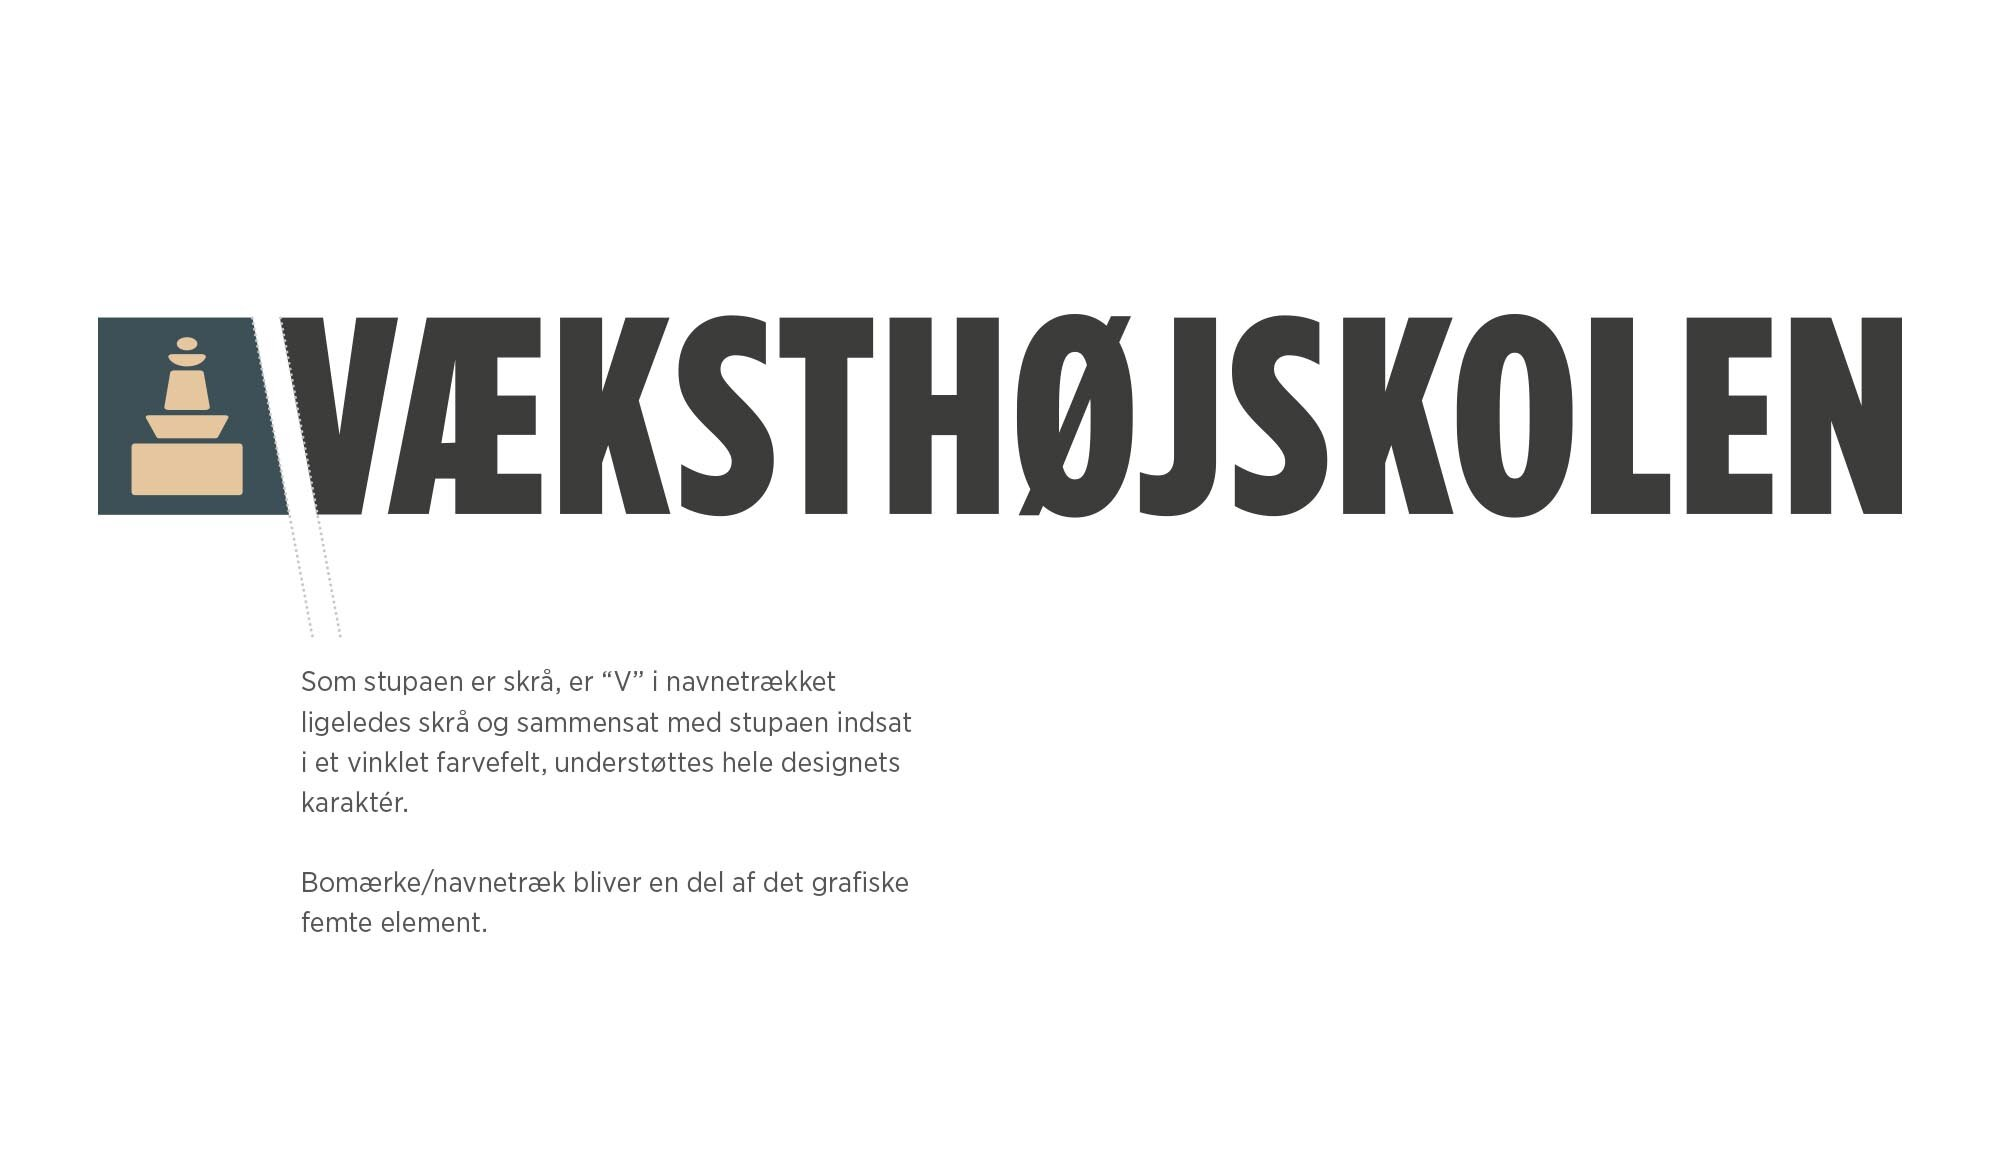 VÆKSTHØJSKOLEN design 01.jpg